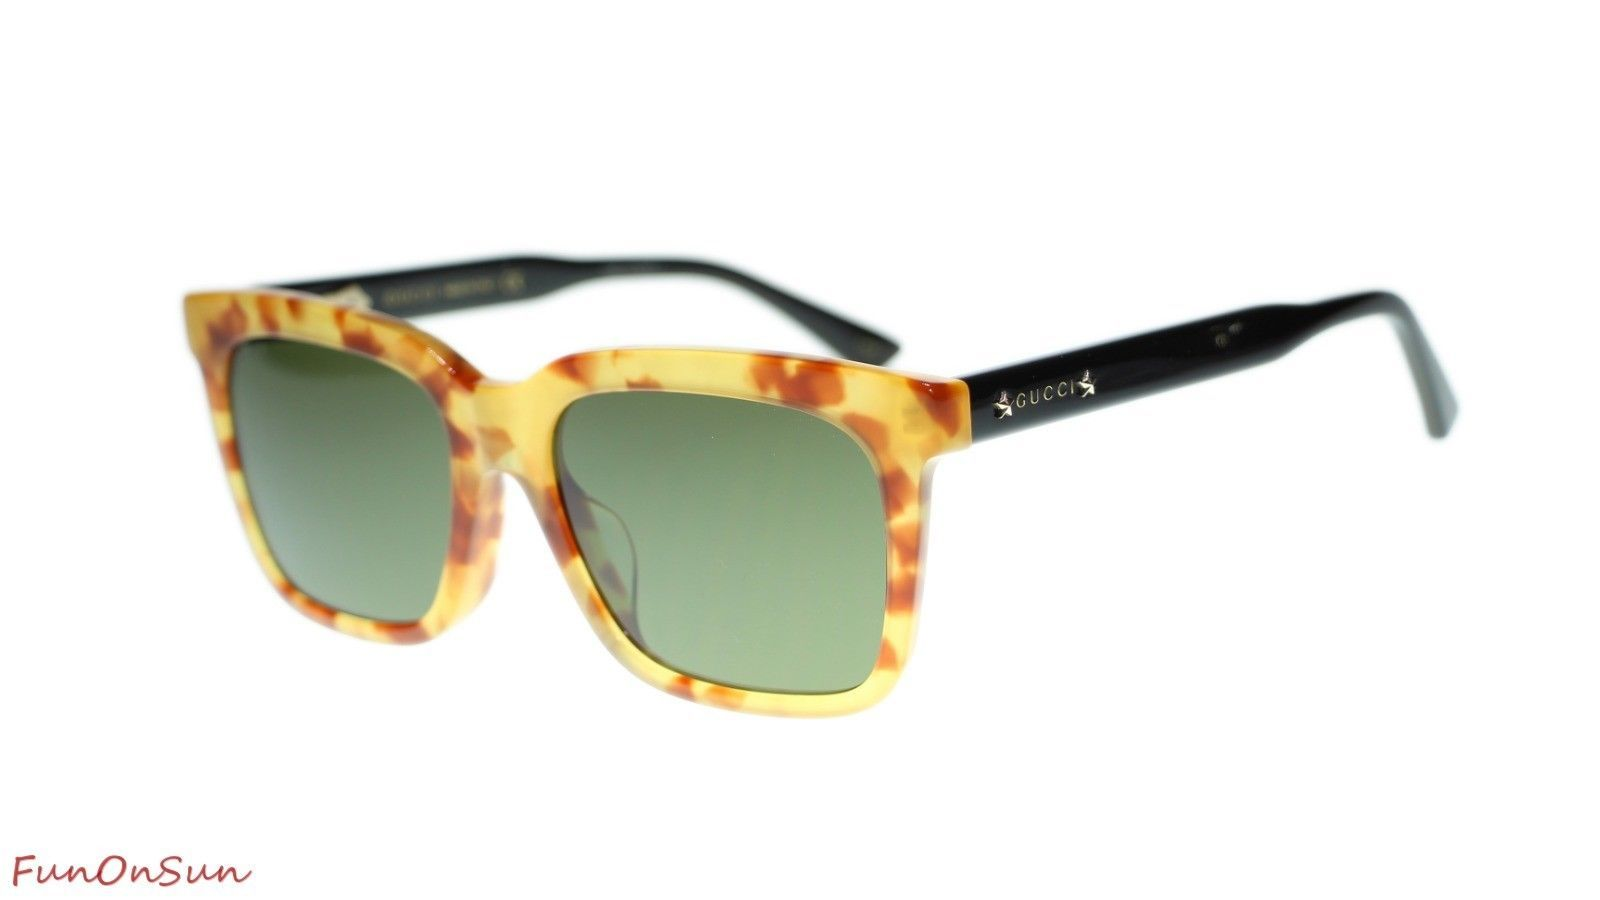 bcebdb1d6f6 NEW Gucci Men s Sunglasses GG0267SA 005 and 47 similar items. 10